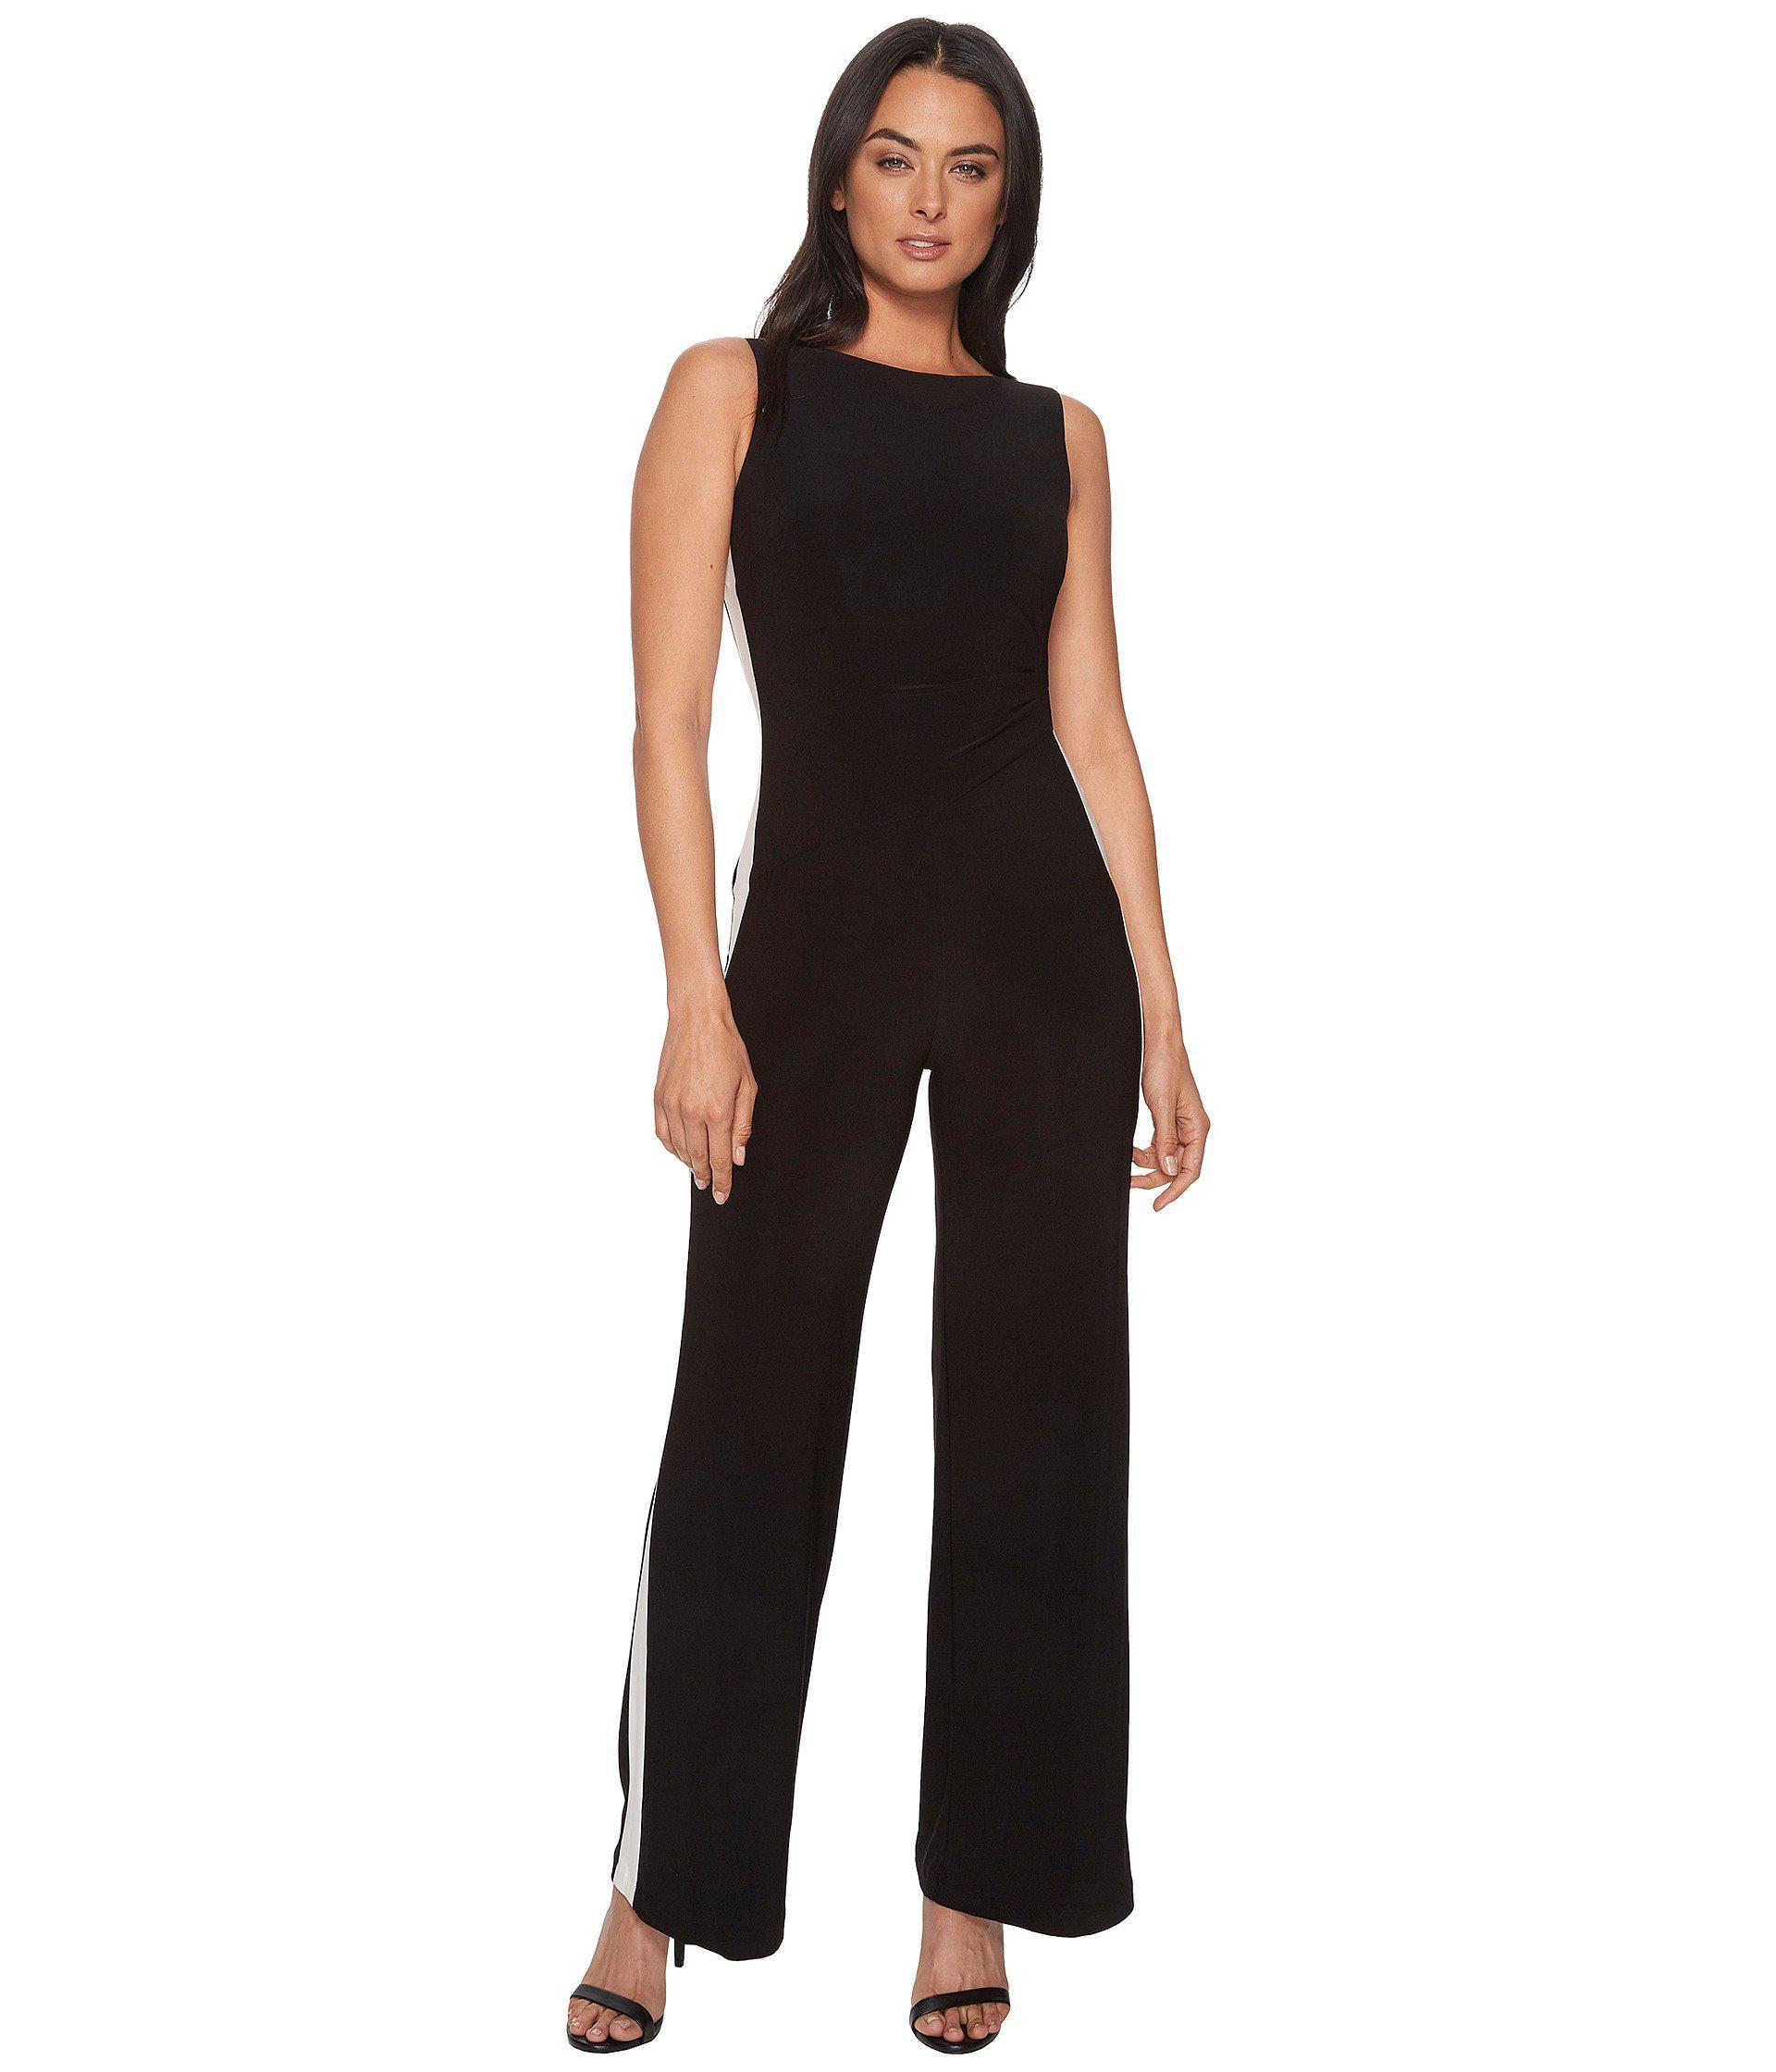 97a78a4c79a Lyst - Lauren by Ralph Lauren Shah Two-tone Matte Jersey Jumpsuit in ...